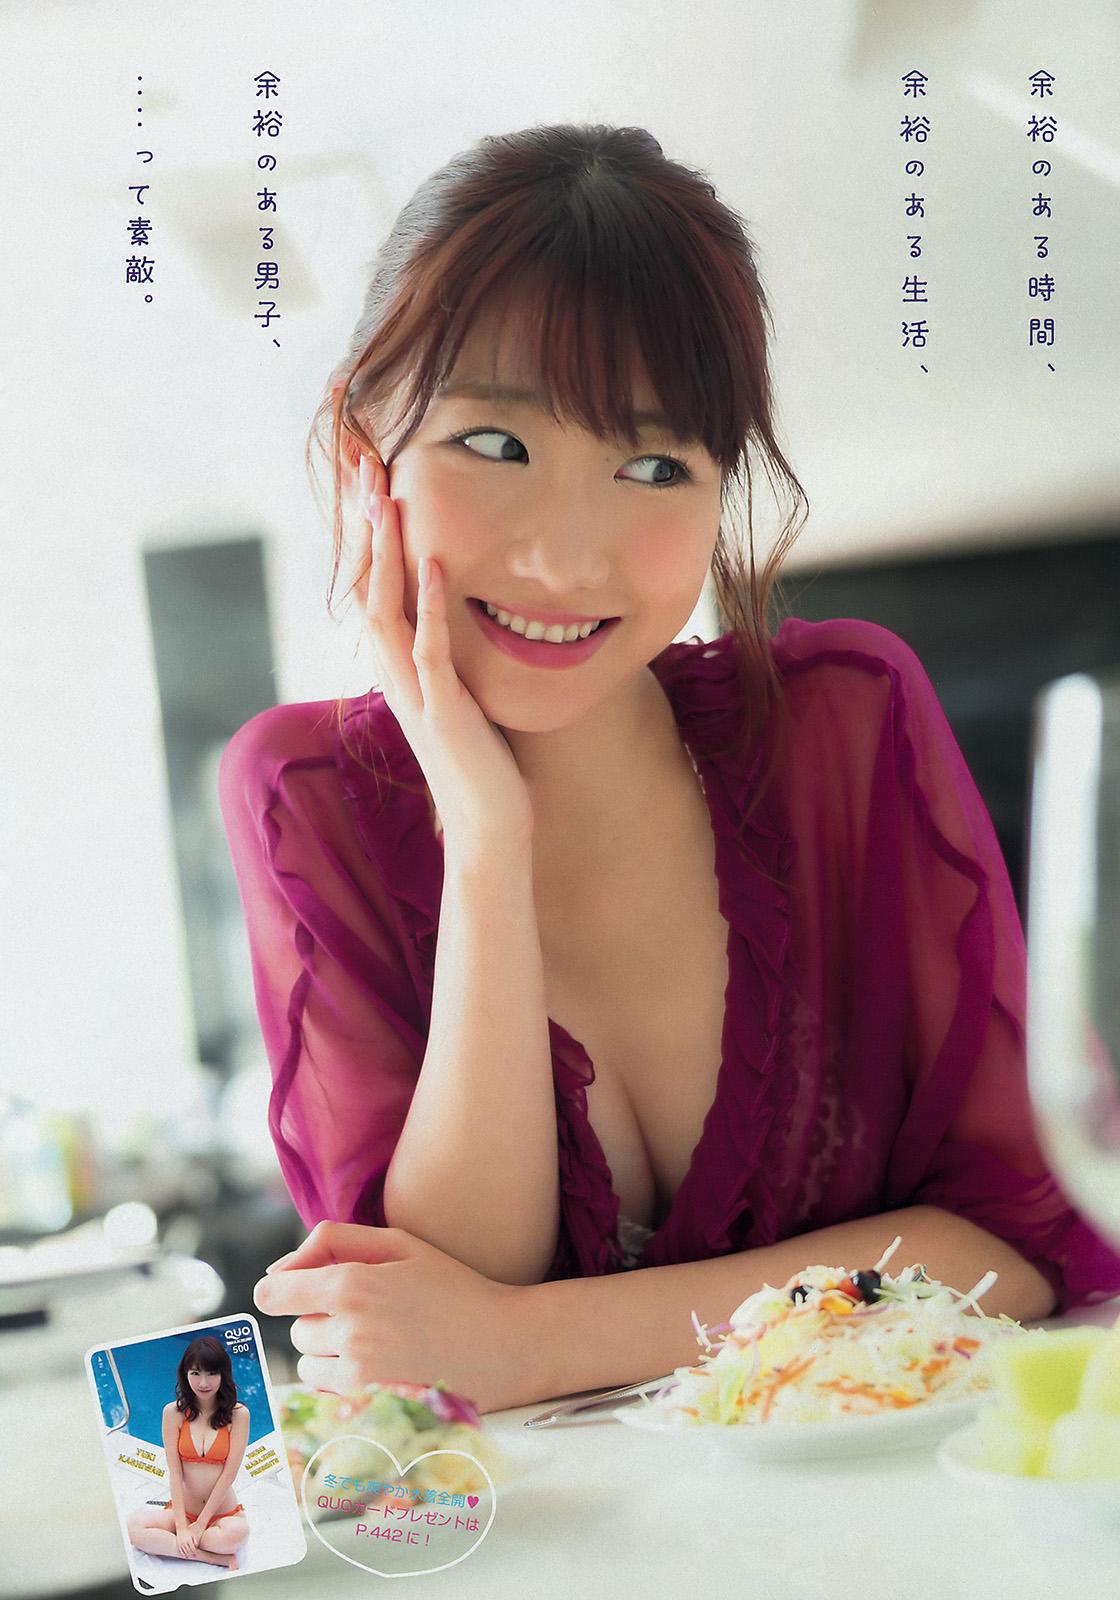 Kashiwagi Yuki 柏木由紀 Young Magazine 2016 No 2 Pictures 4